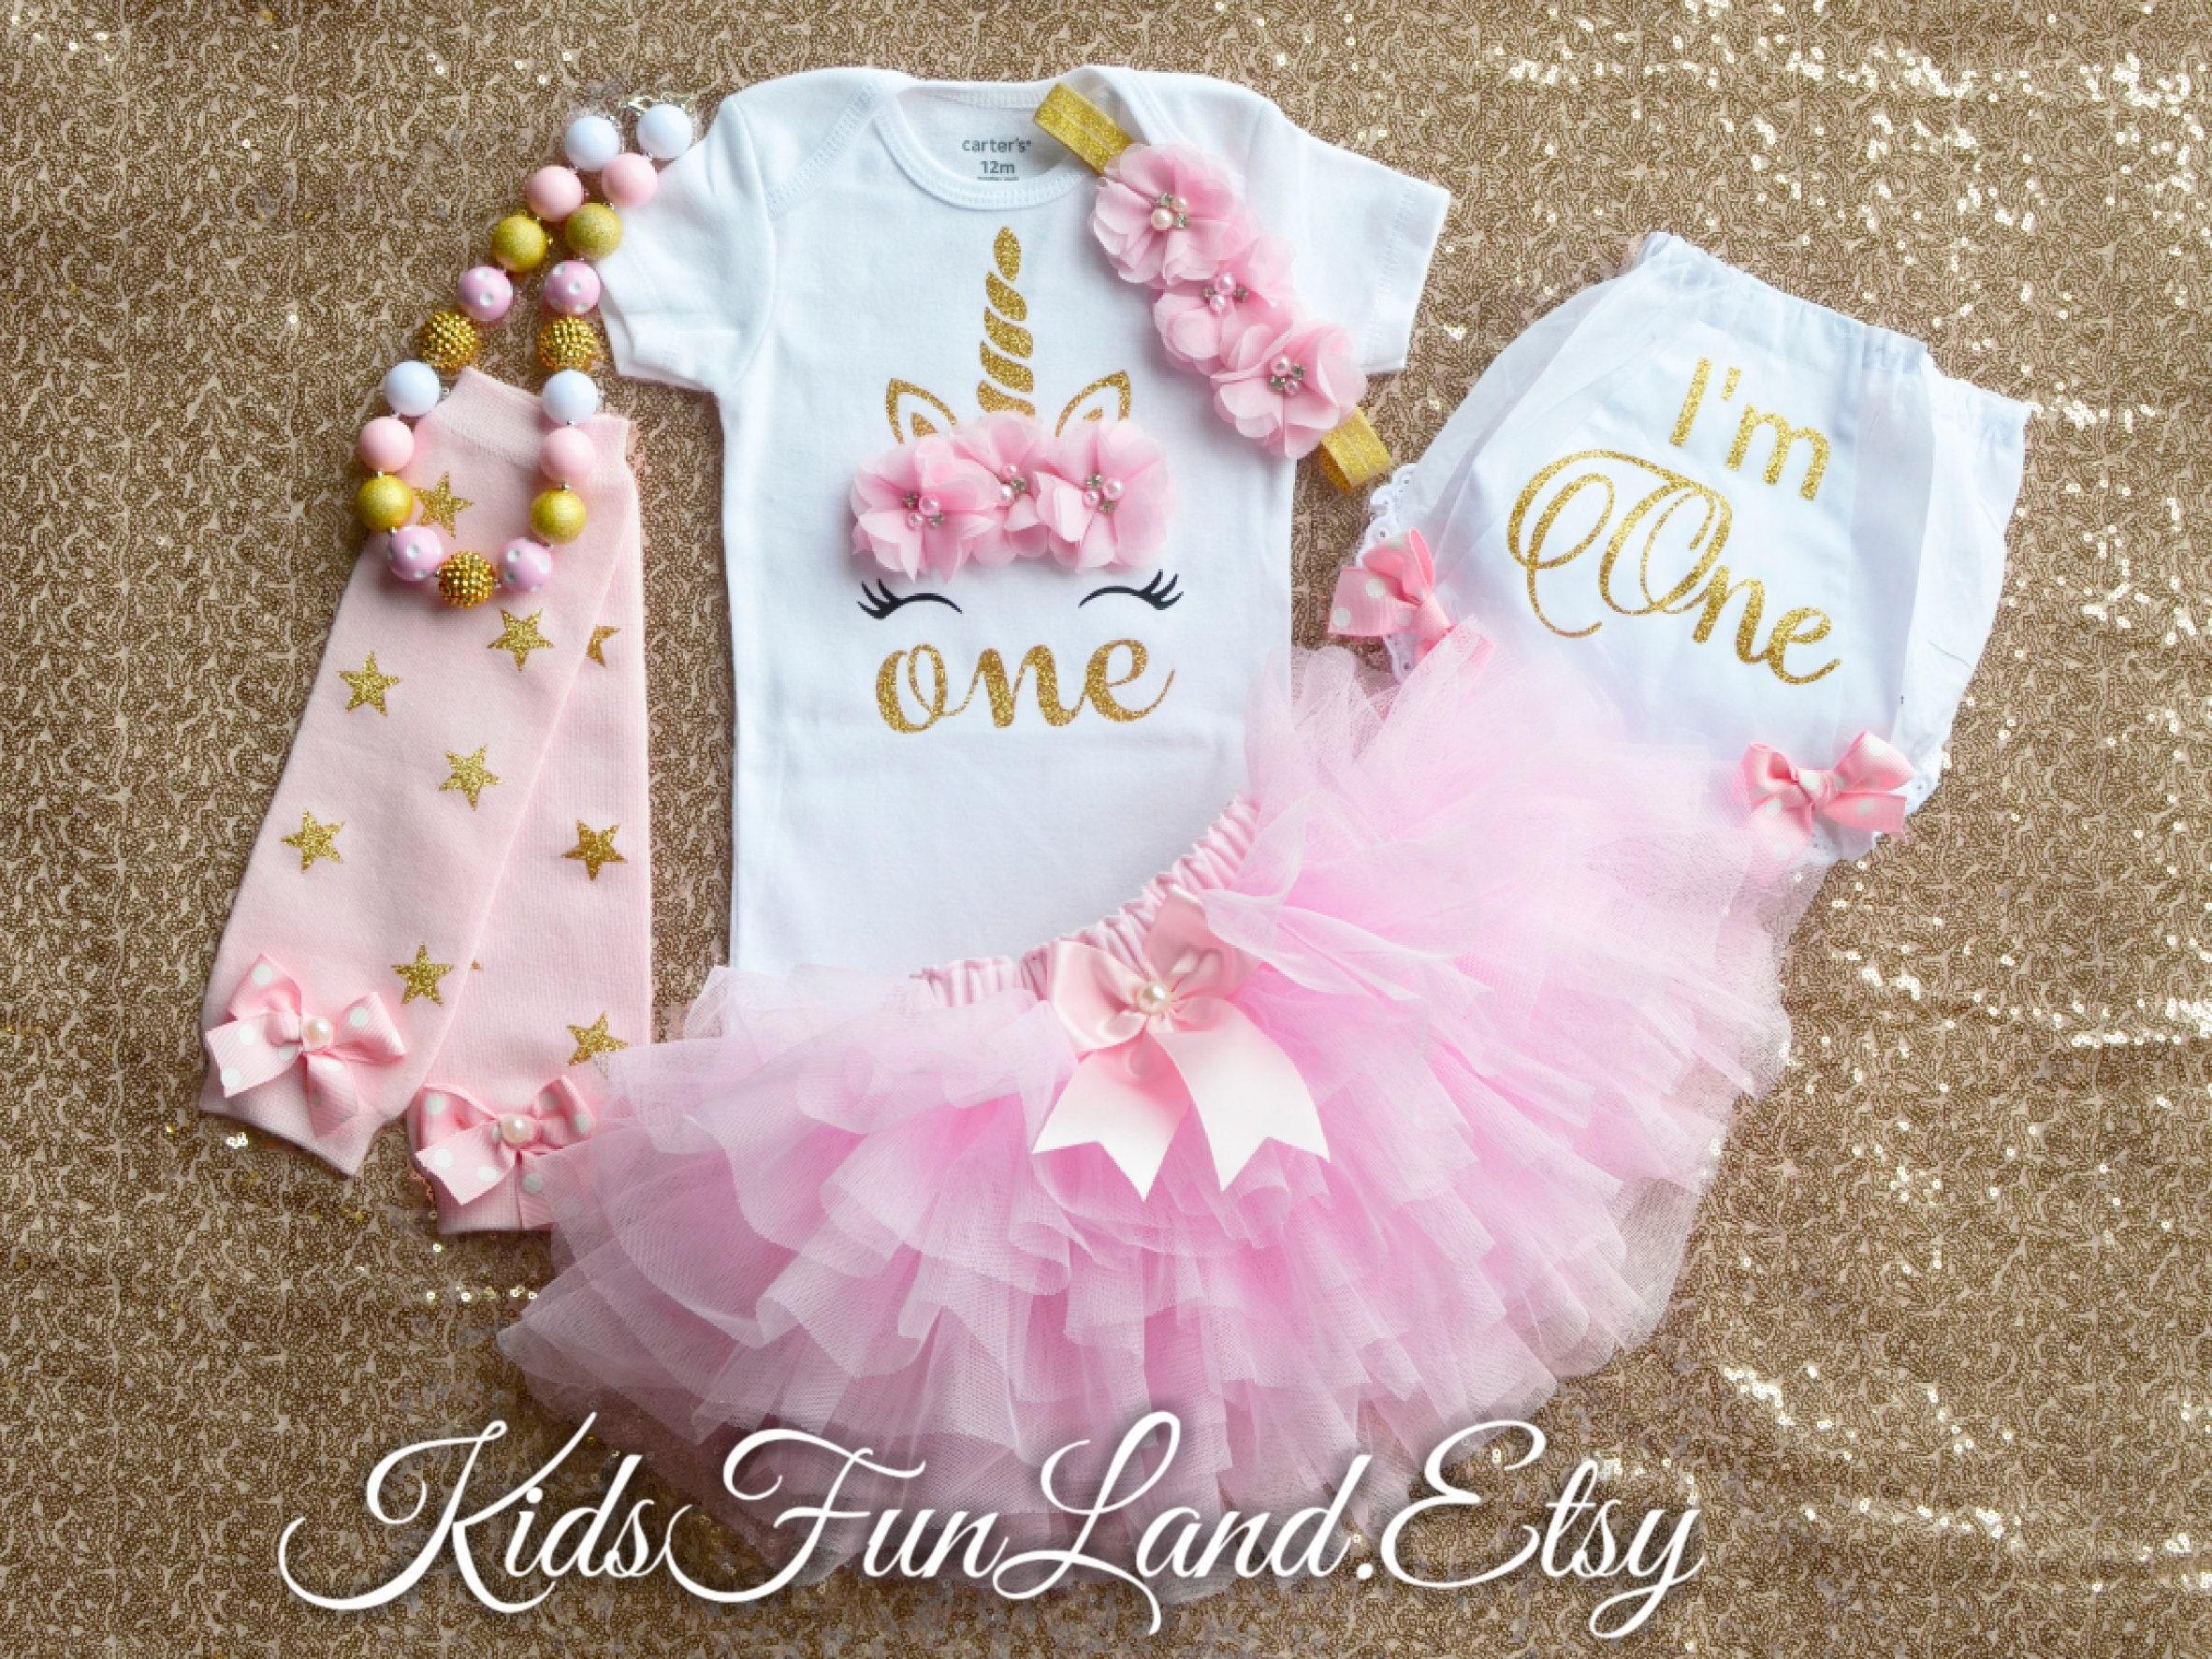 Girls First 1 Pink White Gold Unicorn Cake Smash Tutu Outfit Photo Shoot